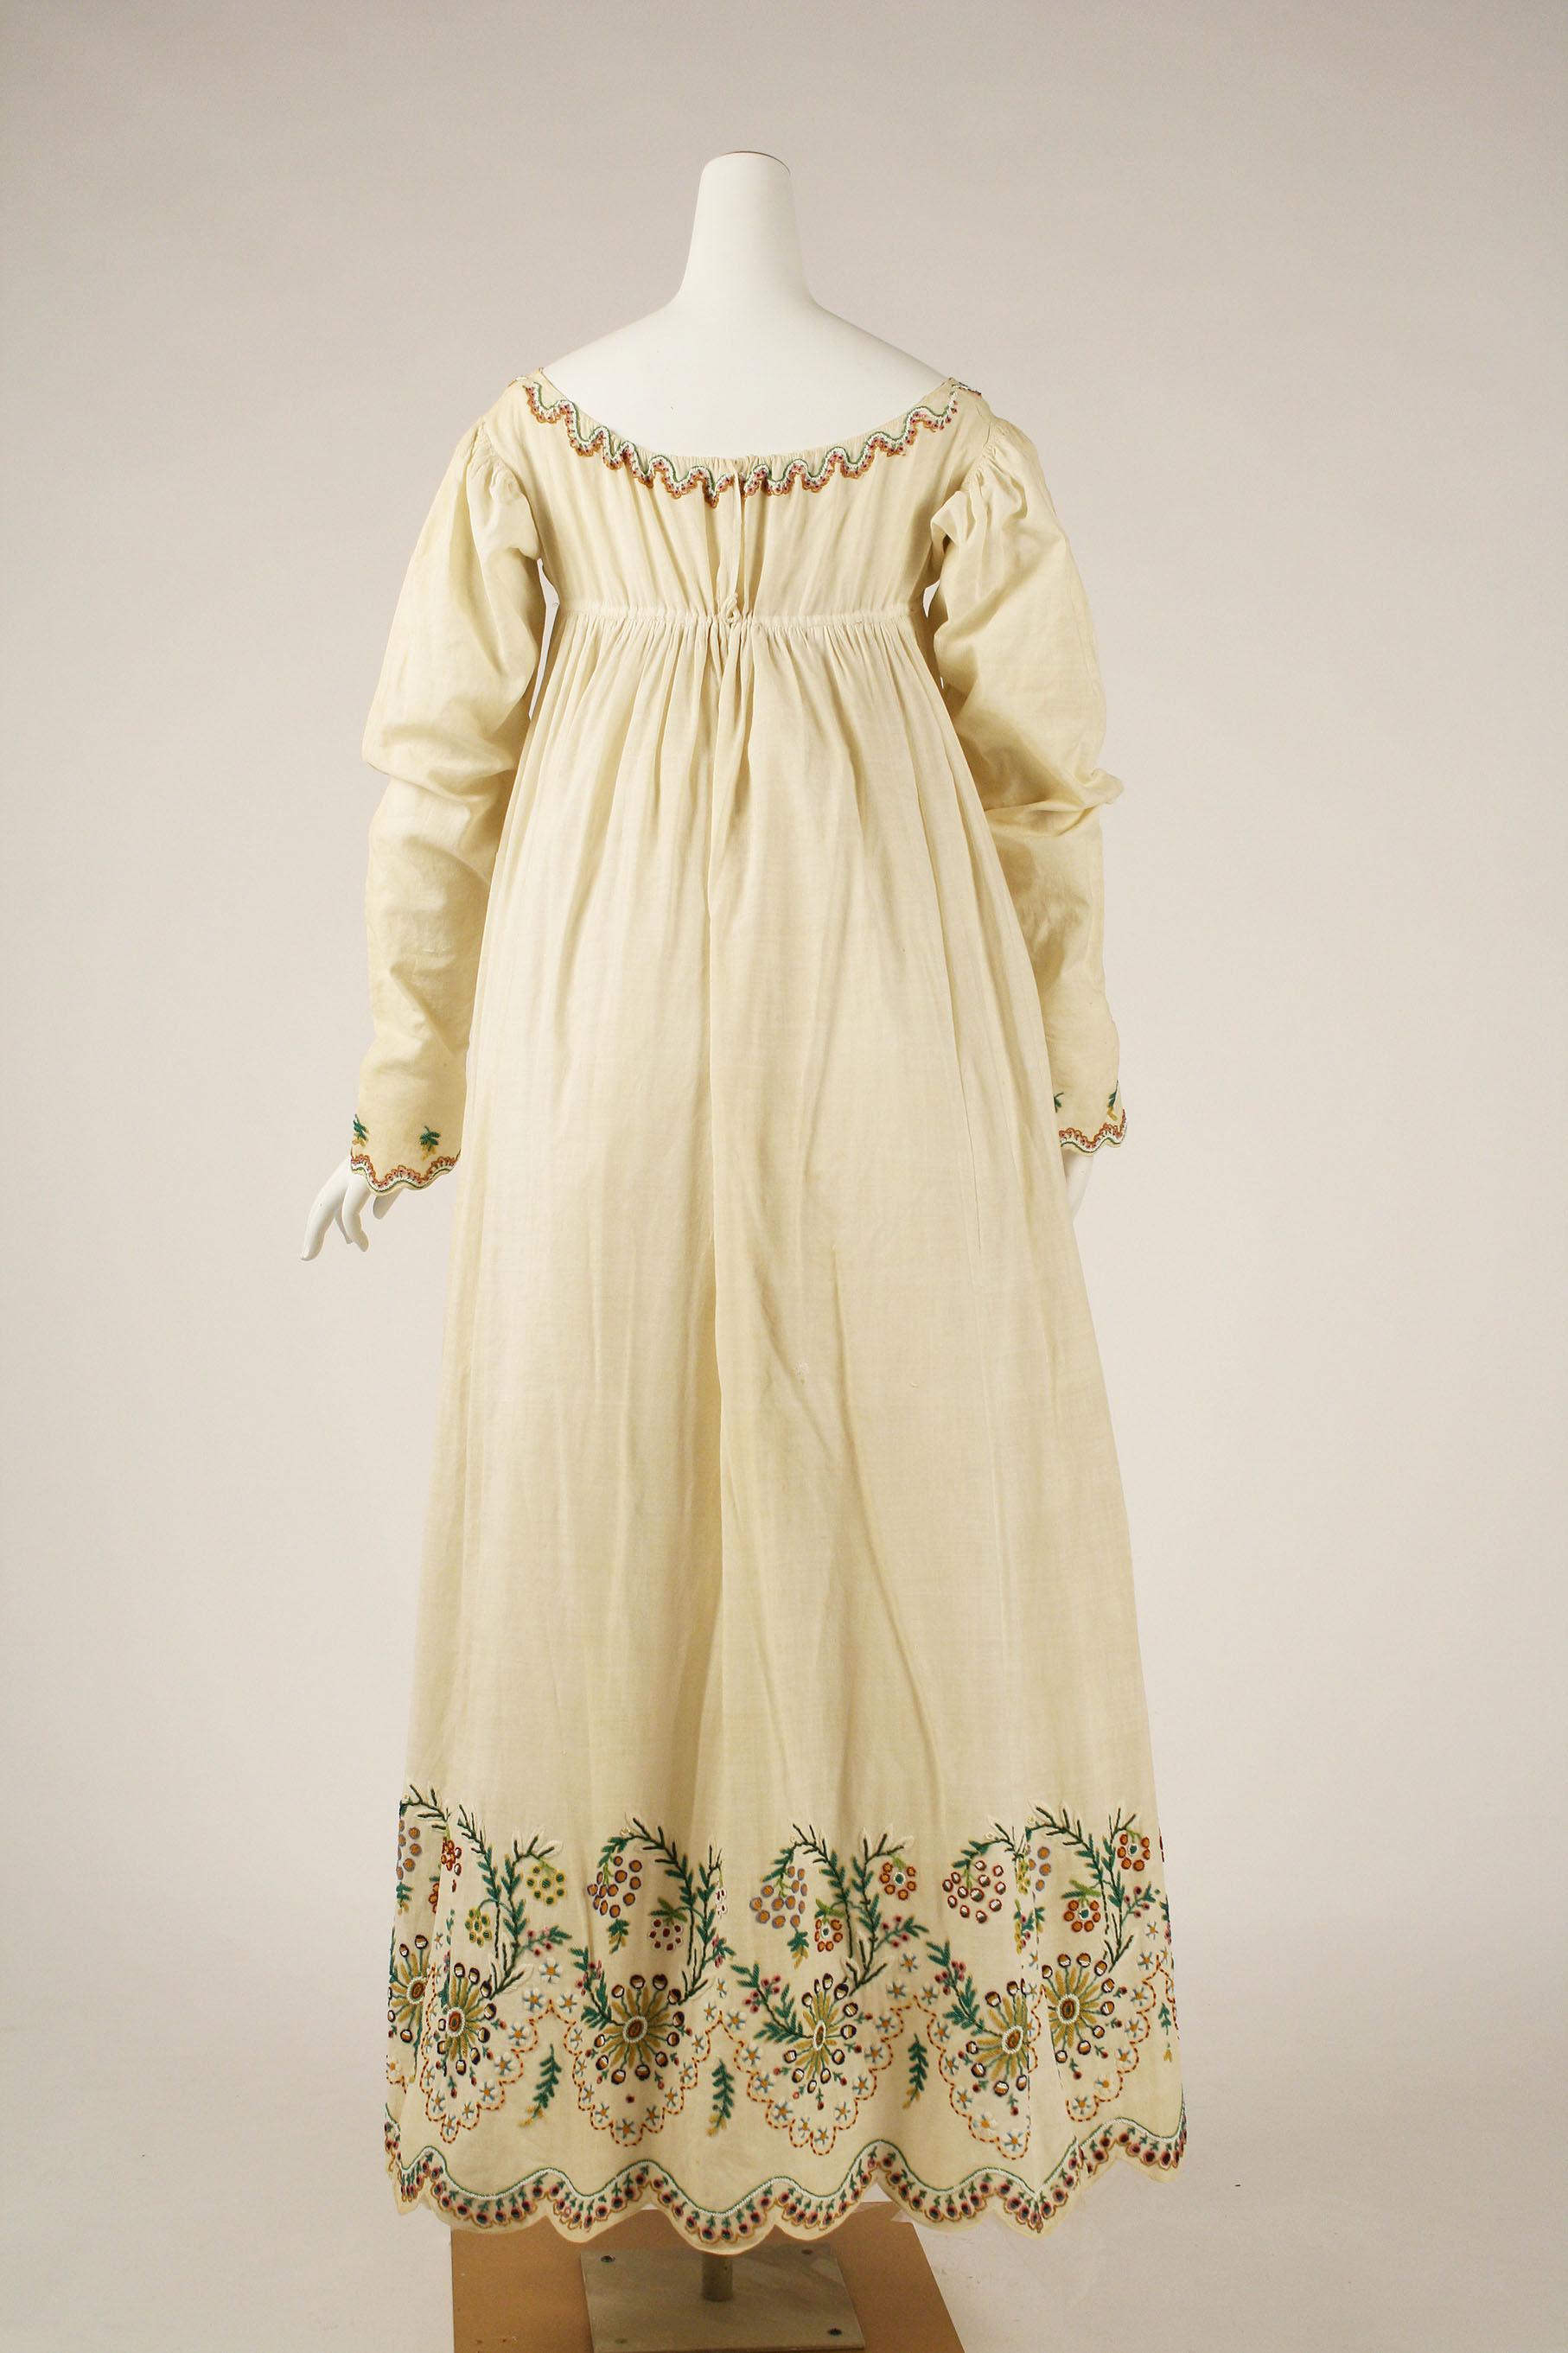 Dress, 1804–15, Austrian, cotton & glass, Metropolitan Museum of Art, C.I.39.13.52